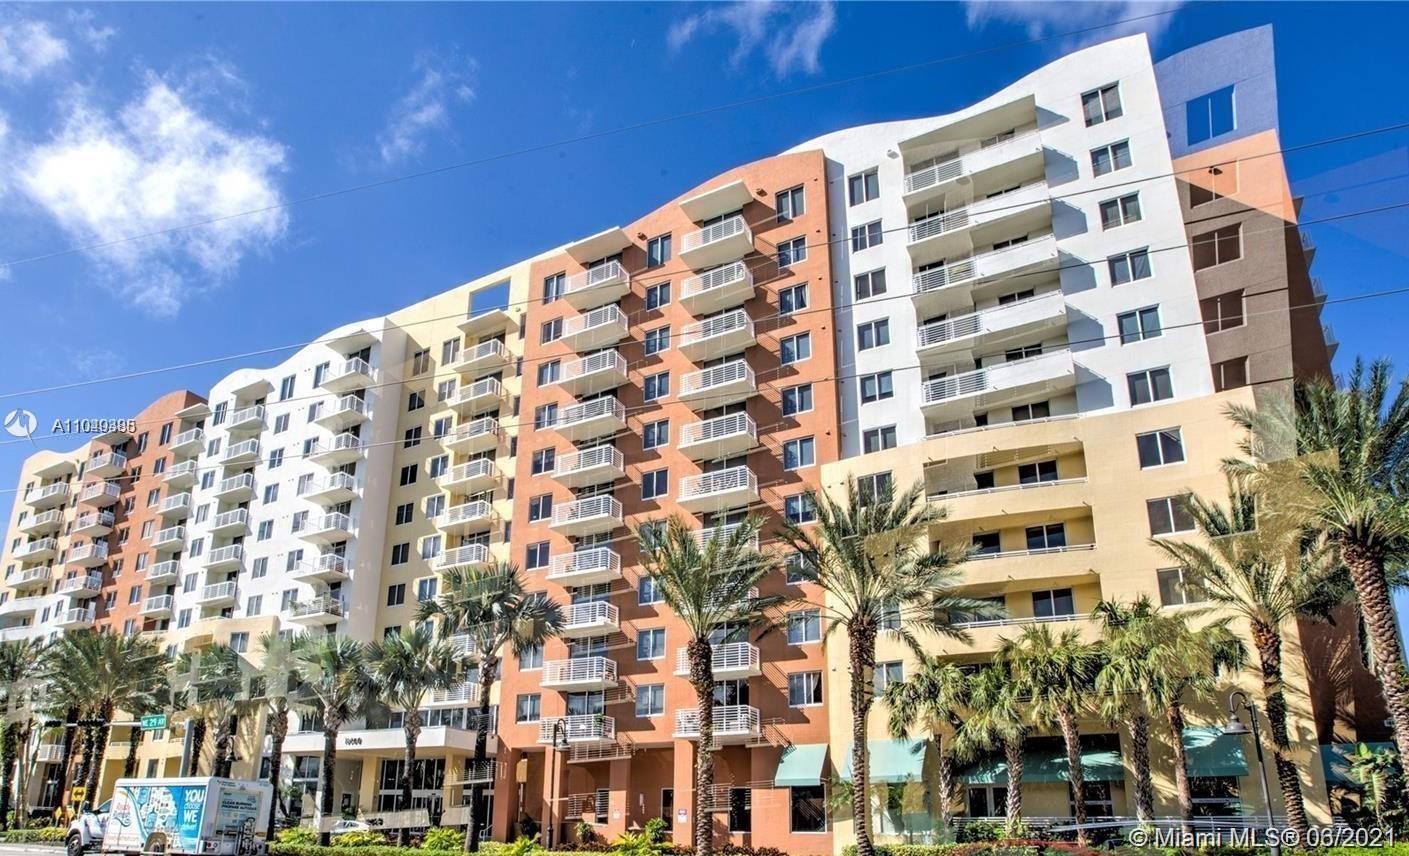 Venture One #529 - 18800 NE 29th Ave #529, Aventura, FL 33180